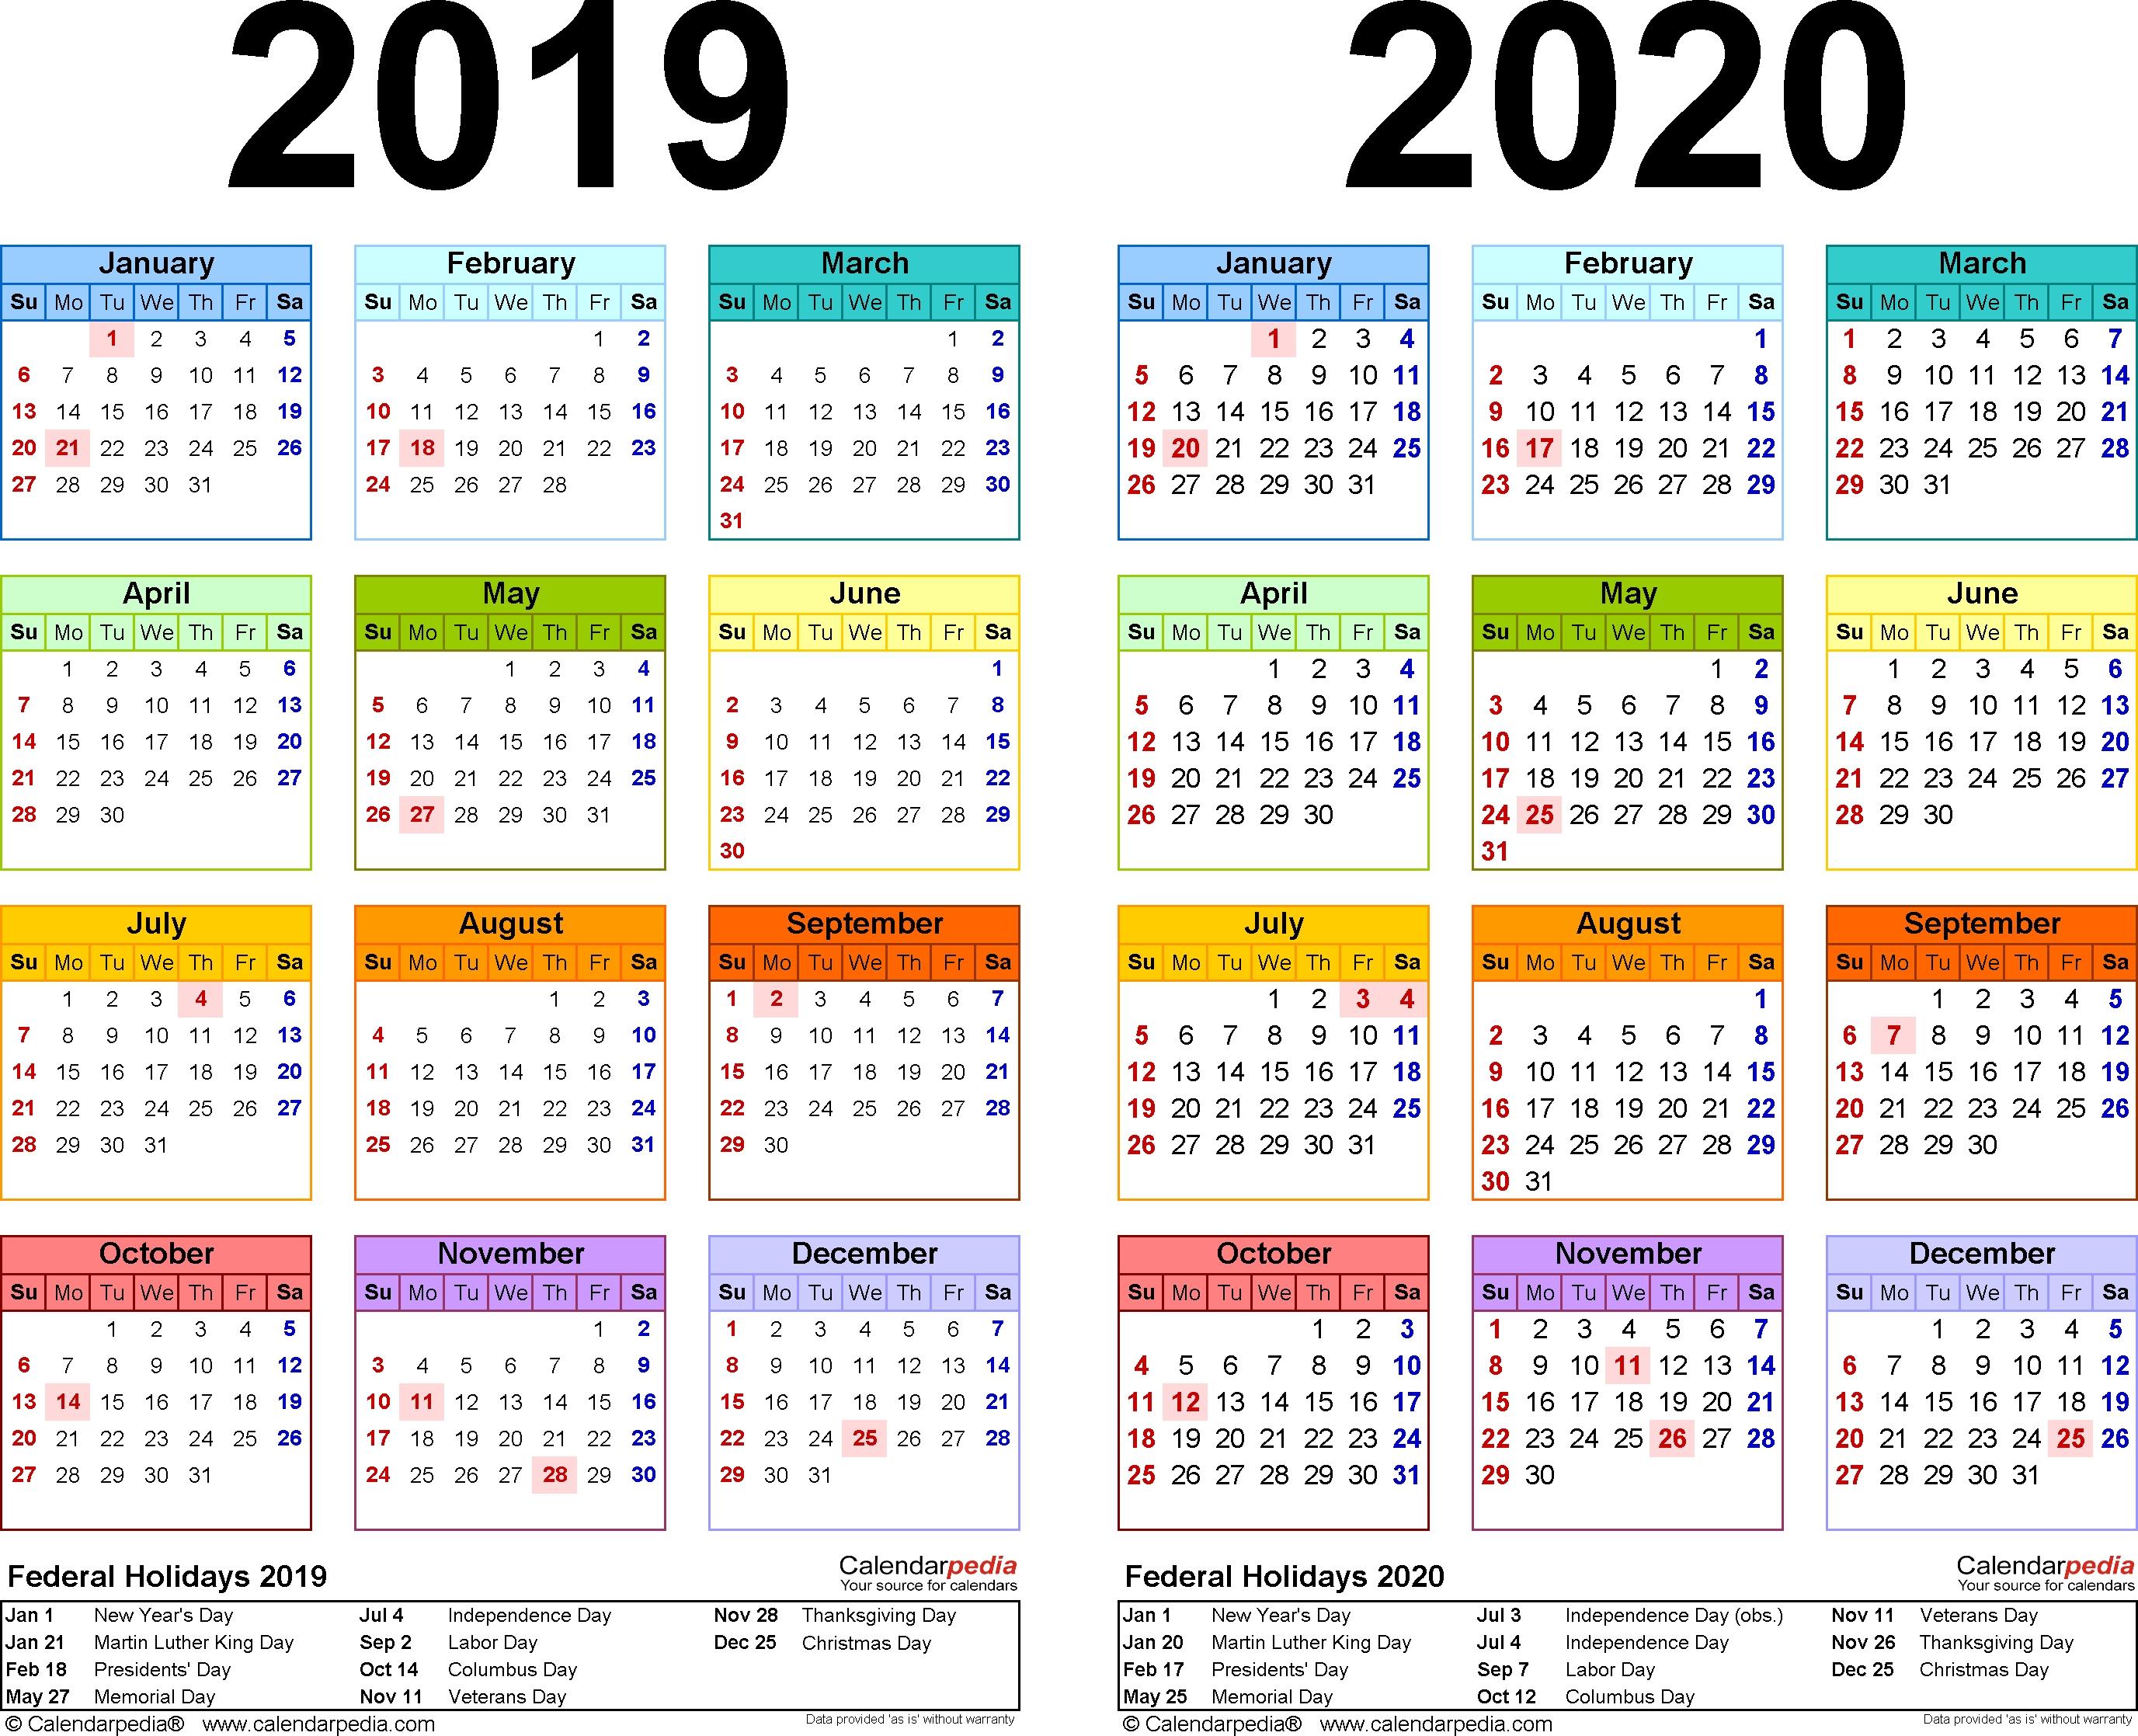 2019-2020 Calendar - Free Printable Two-Year Pdf Calendars regarding Weekly Free Print Calendar 2019 2020